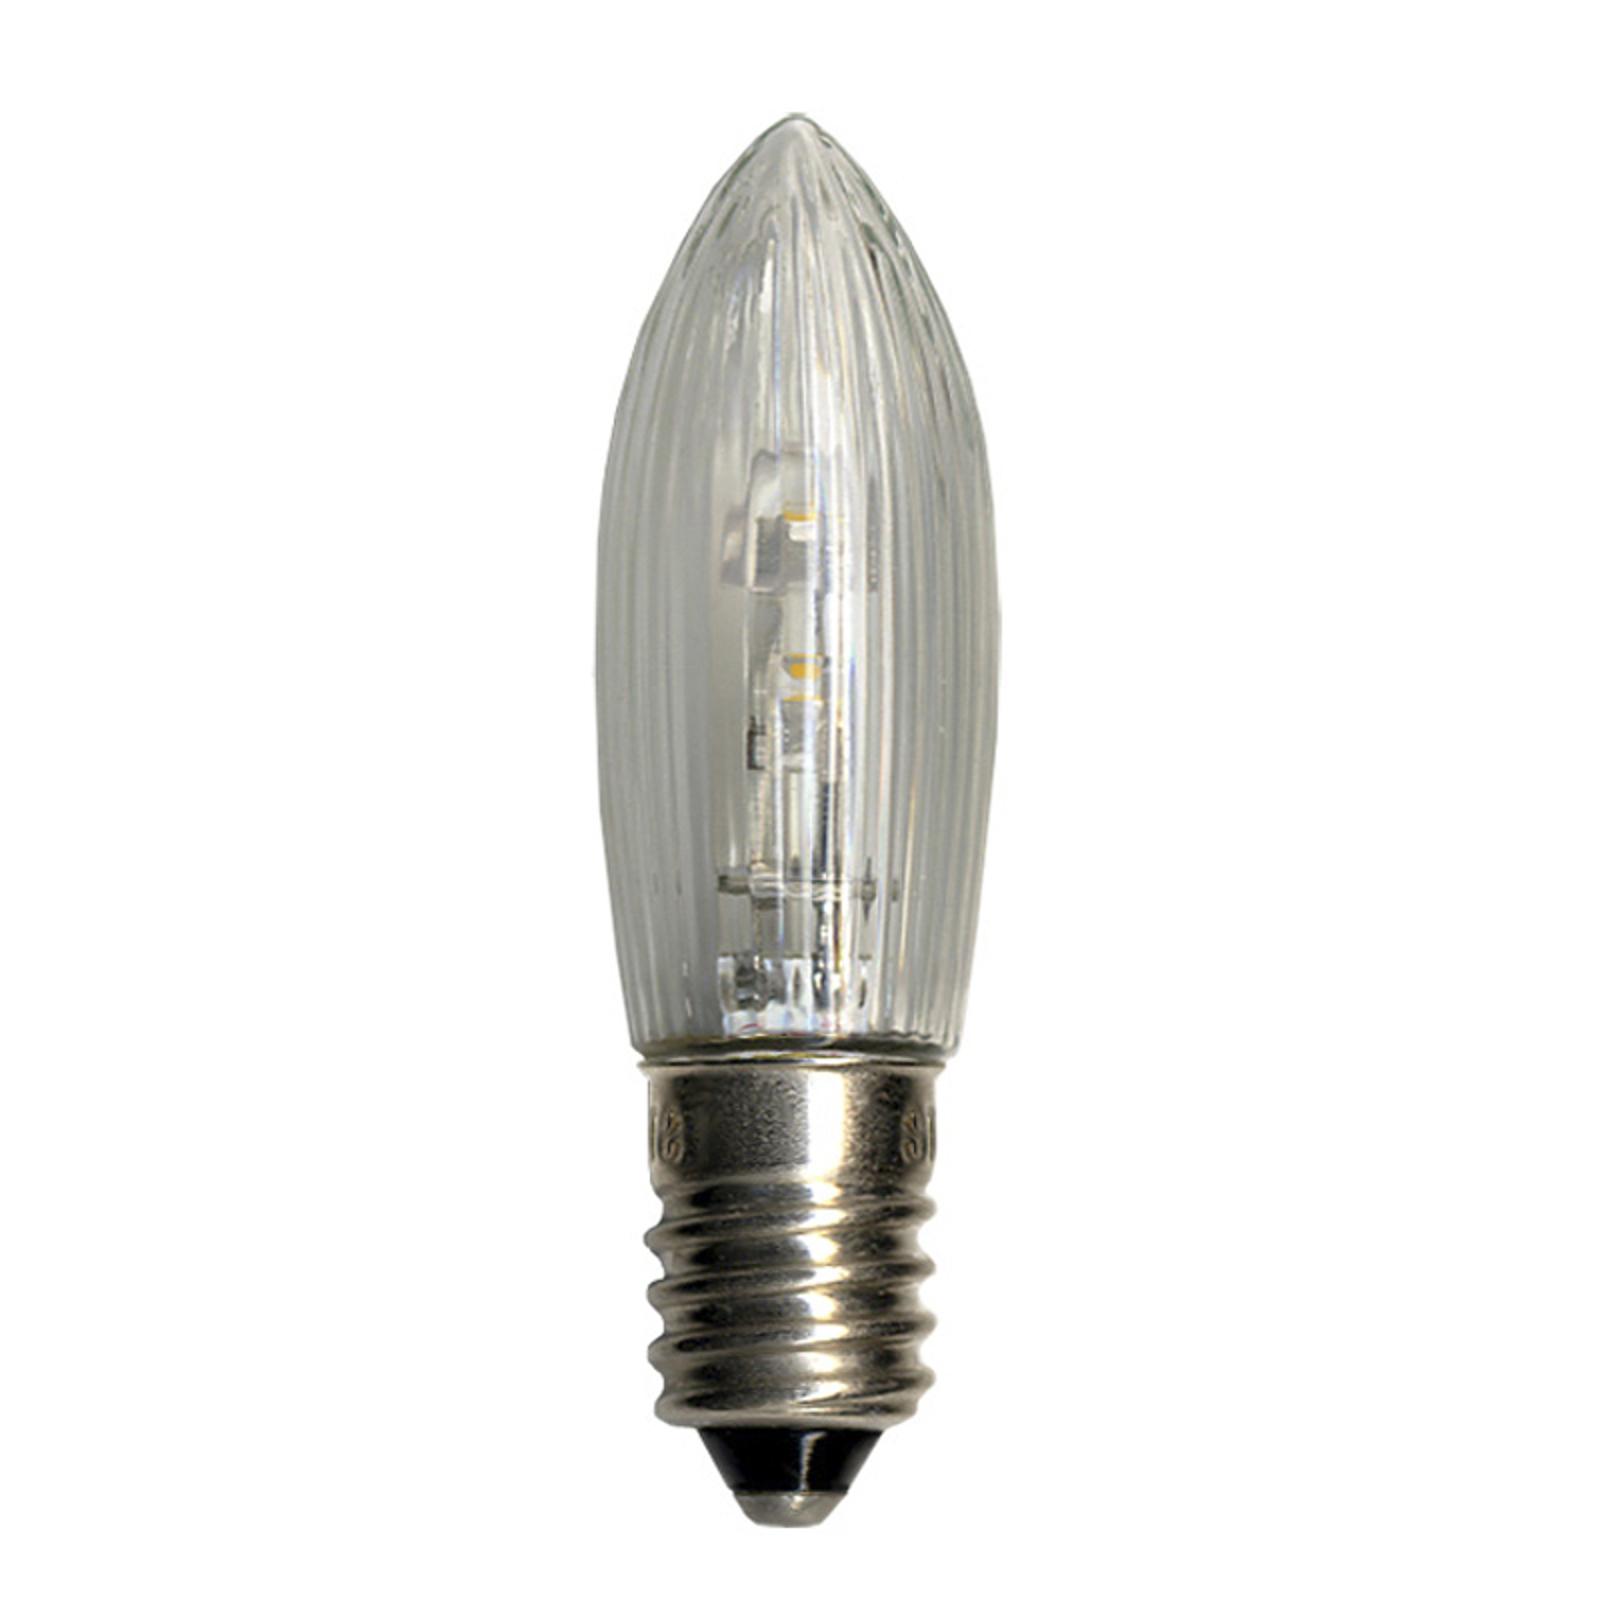 E10 0,2W 10-55 LED reservepære 3-pk stearinlysform